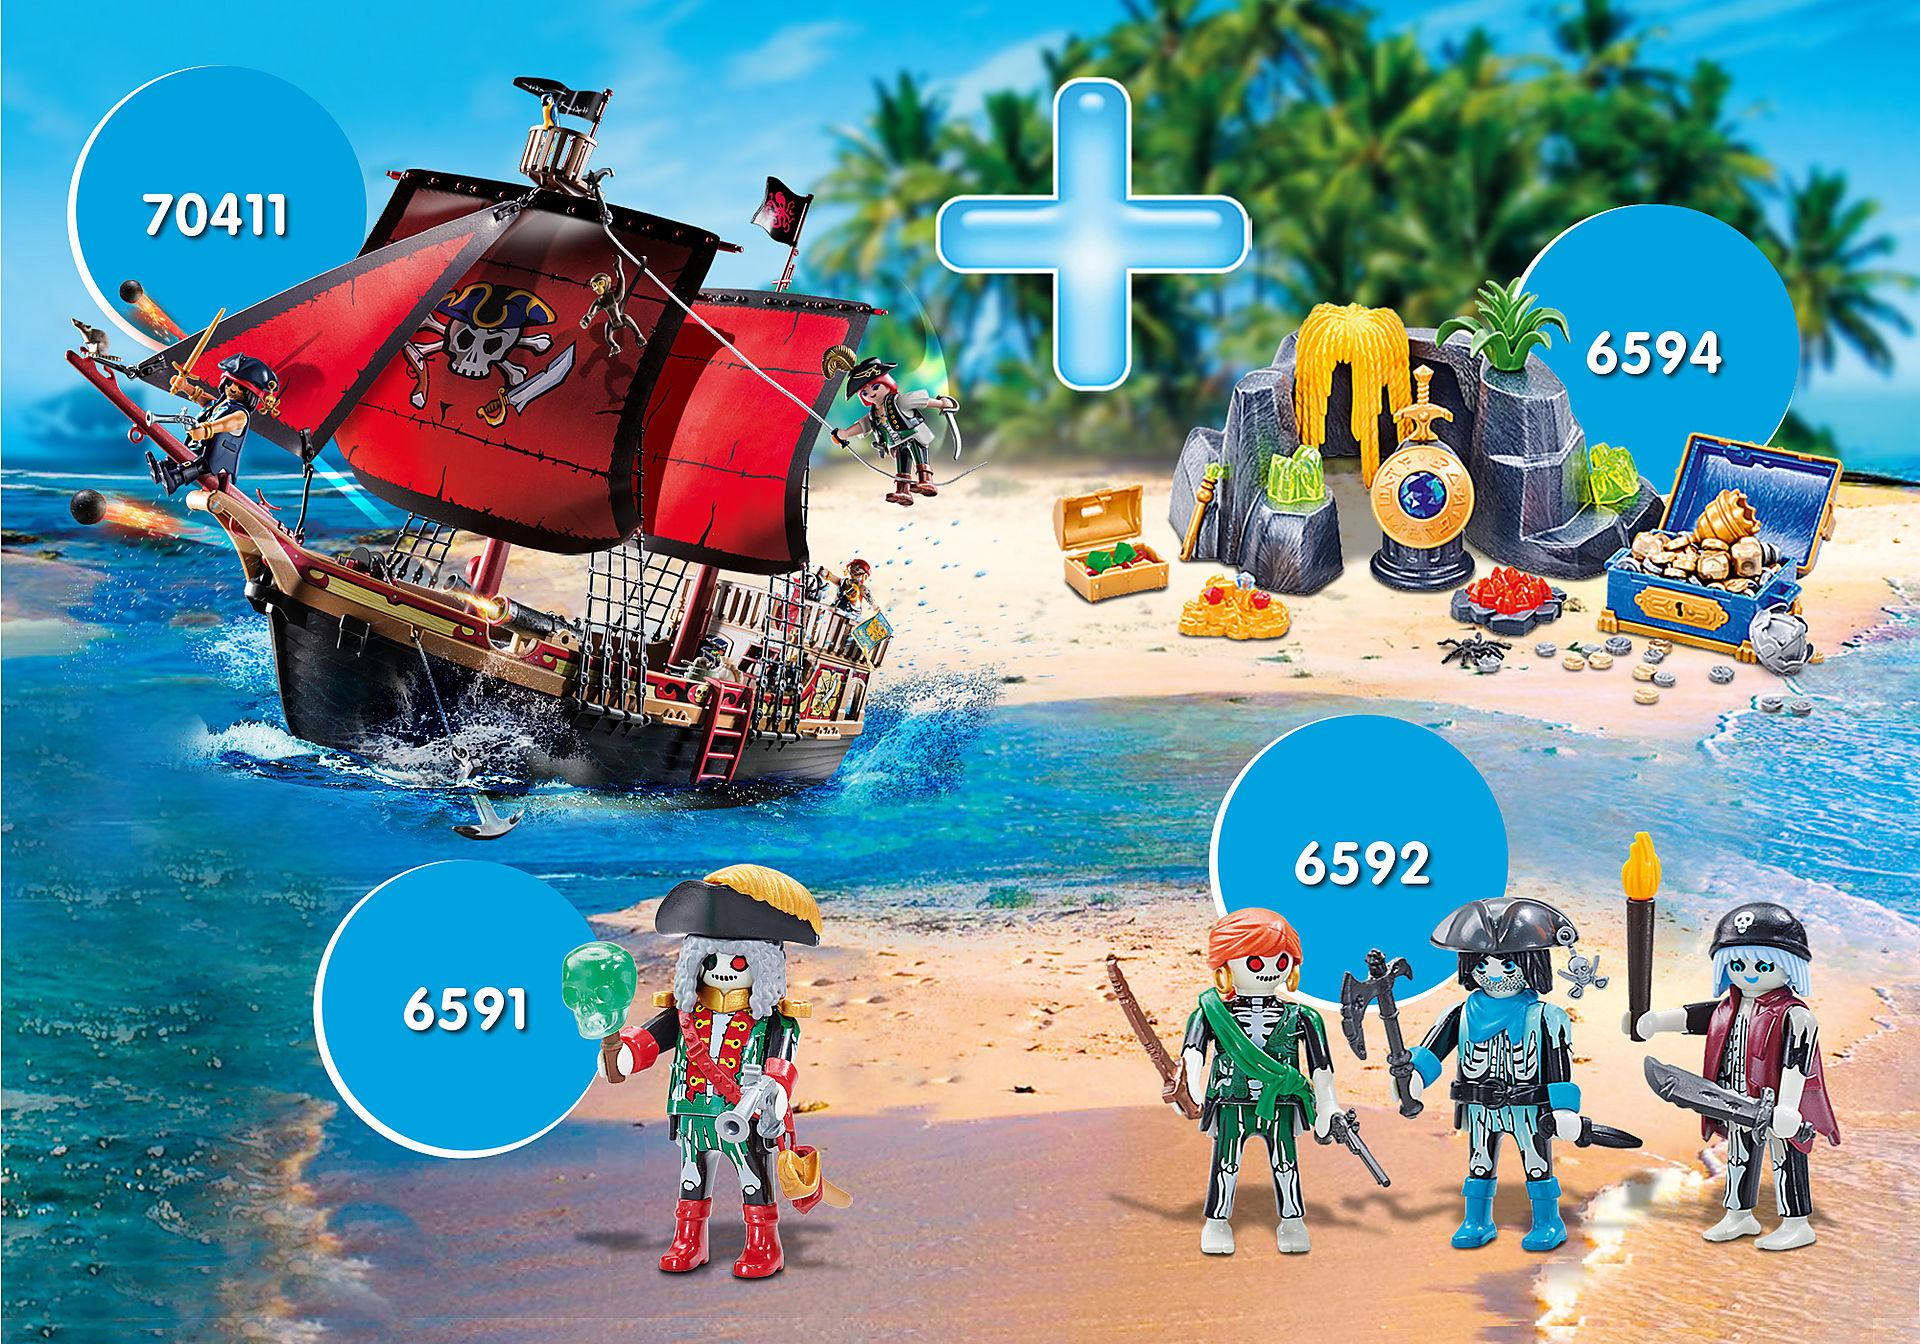 PM2008P Bundle Piraten III/Totenkopf-Kampfschiff zoom image1